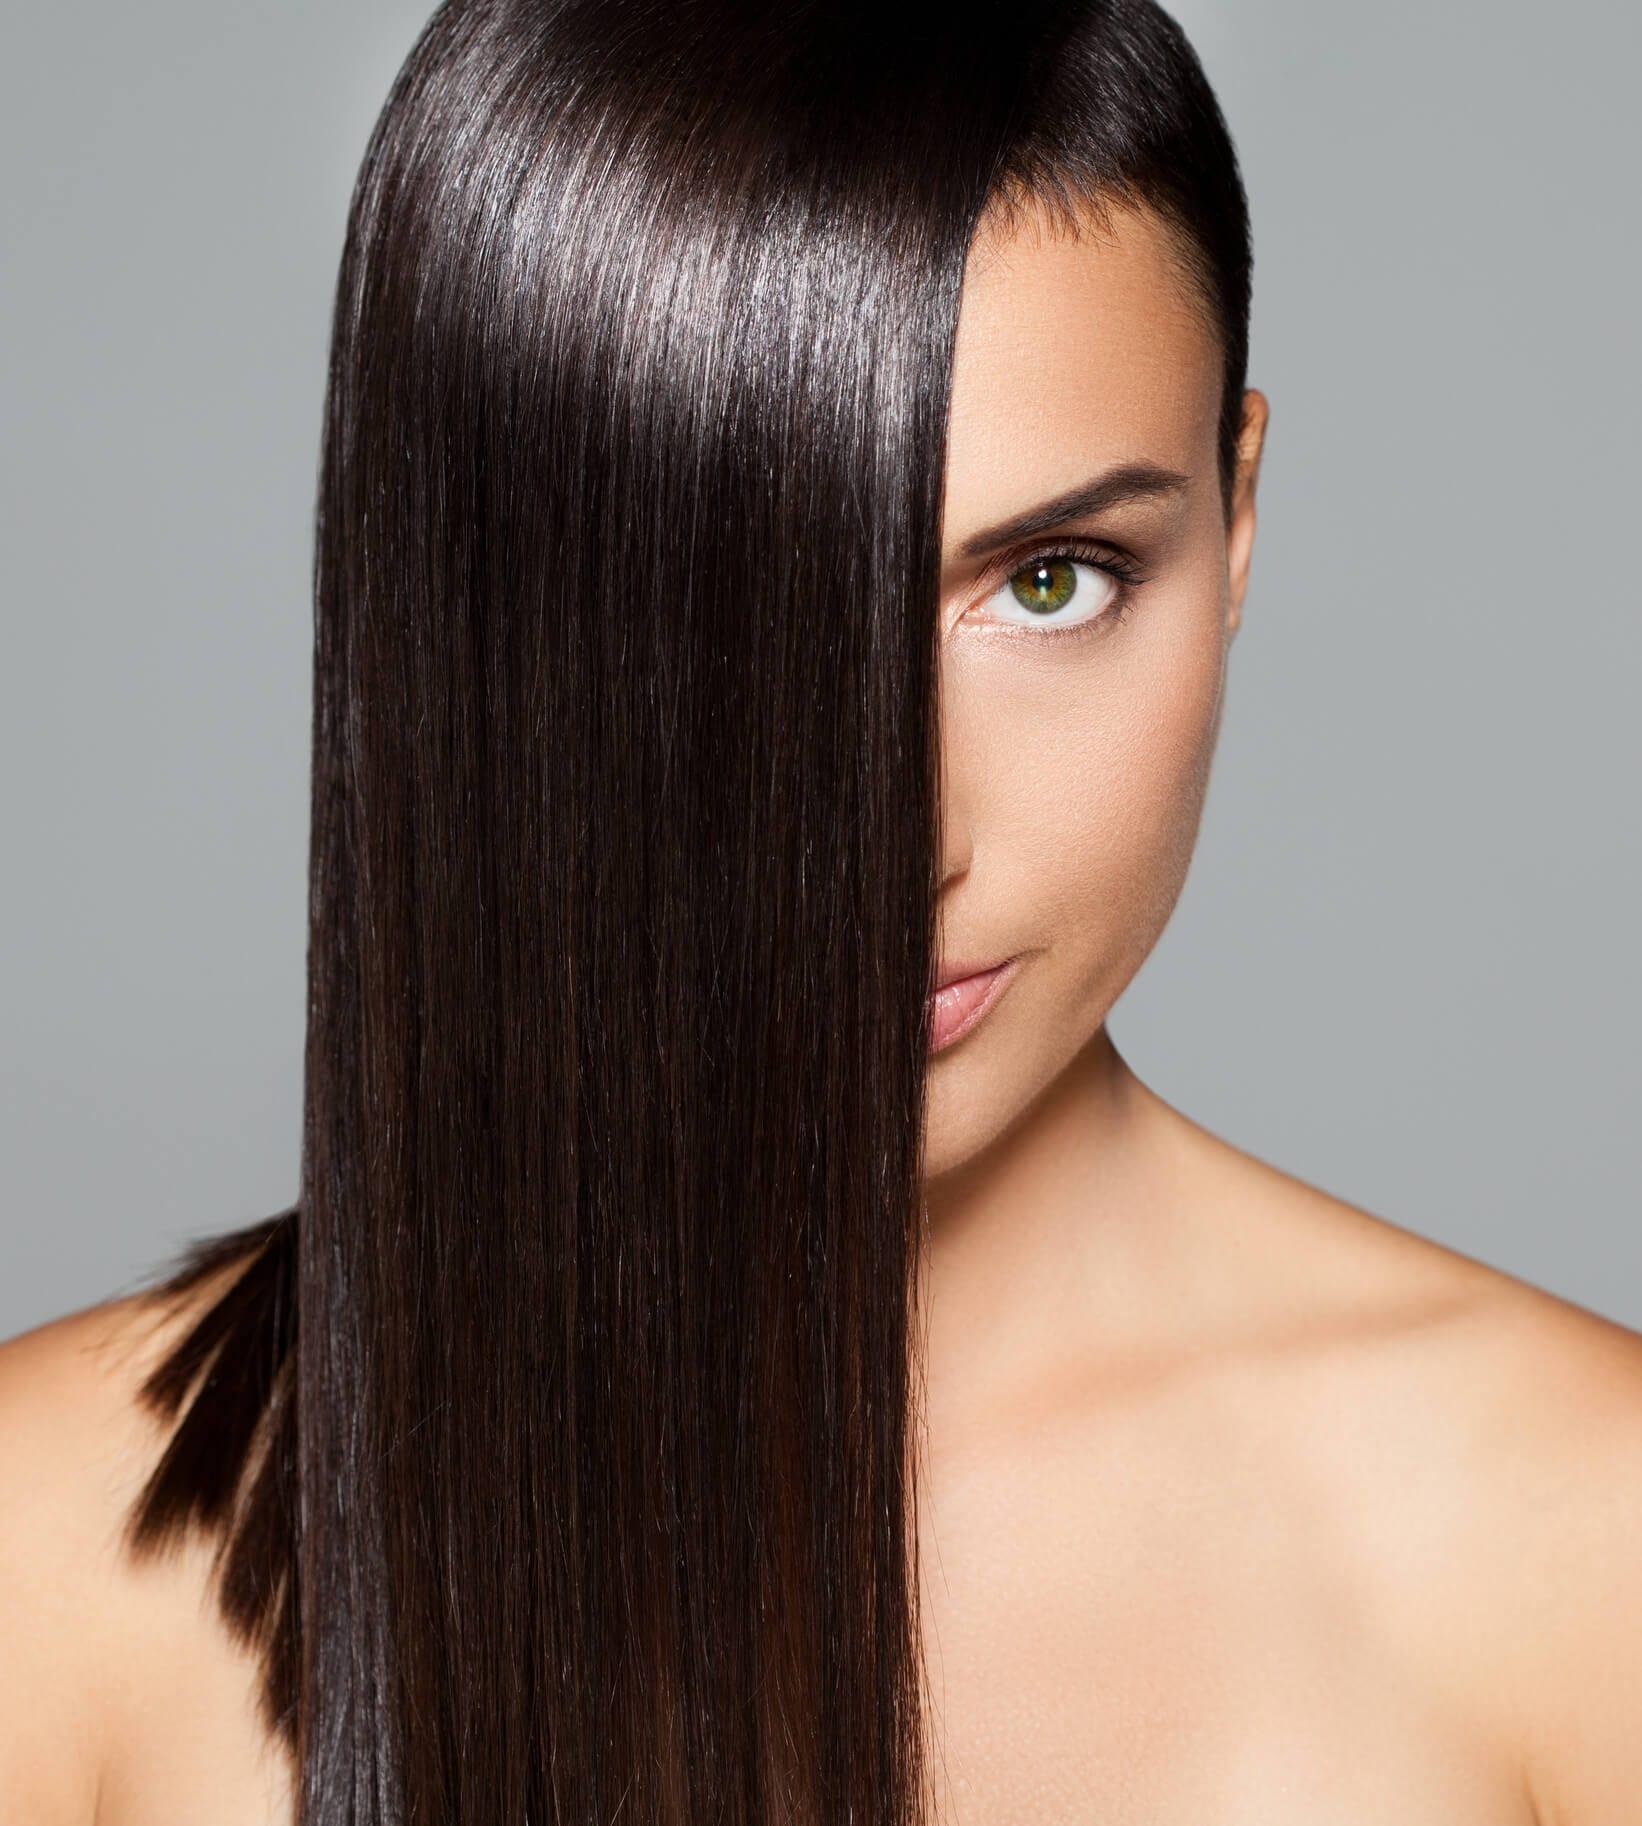 cepillar el cabello lacio con calor pelo liso negro